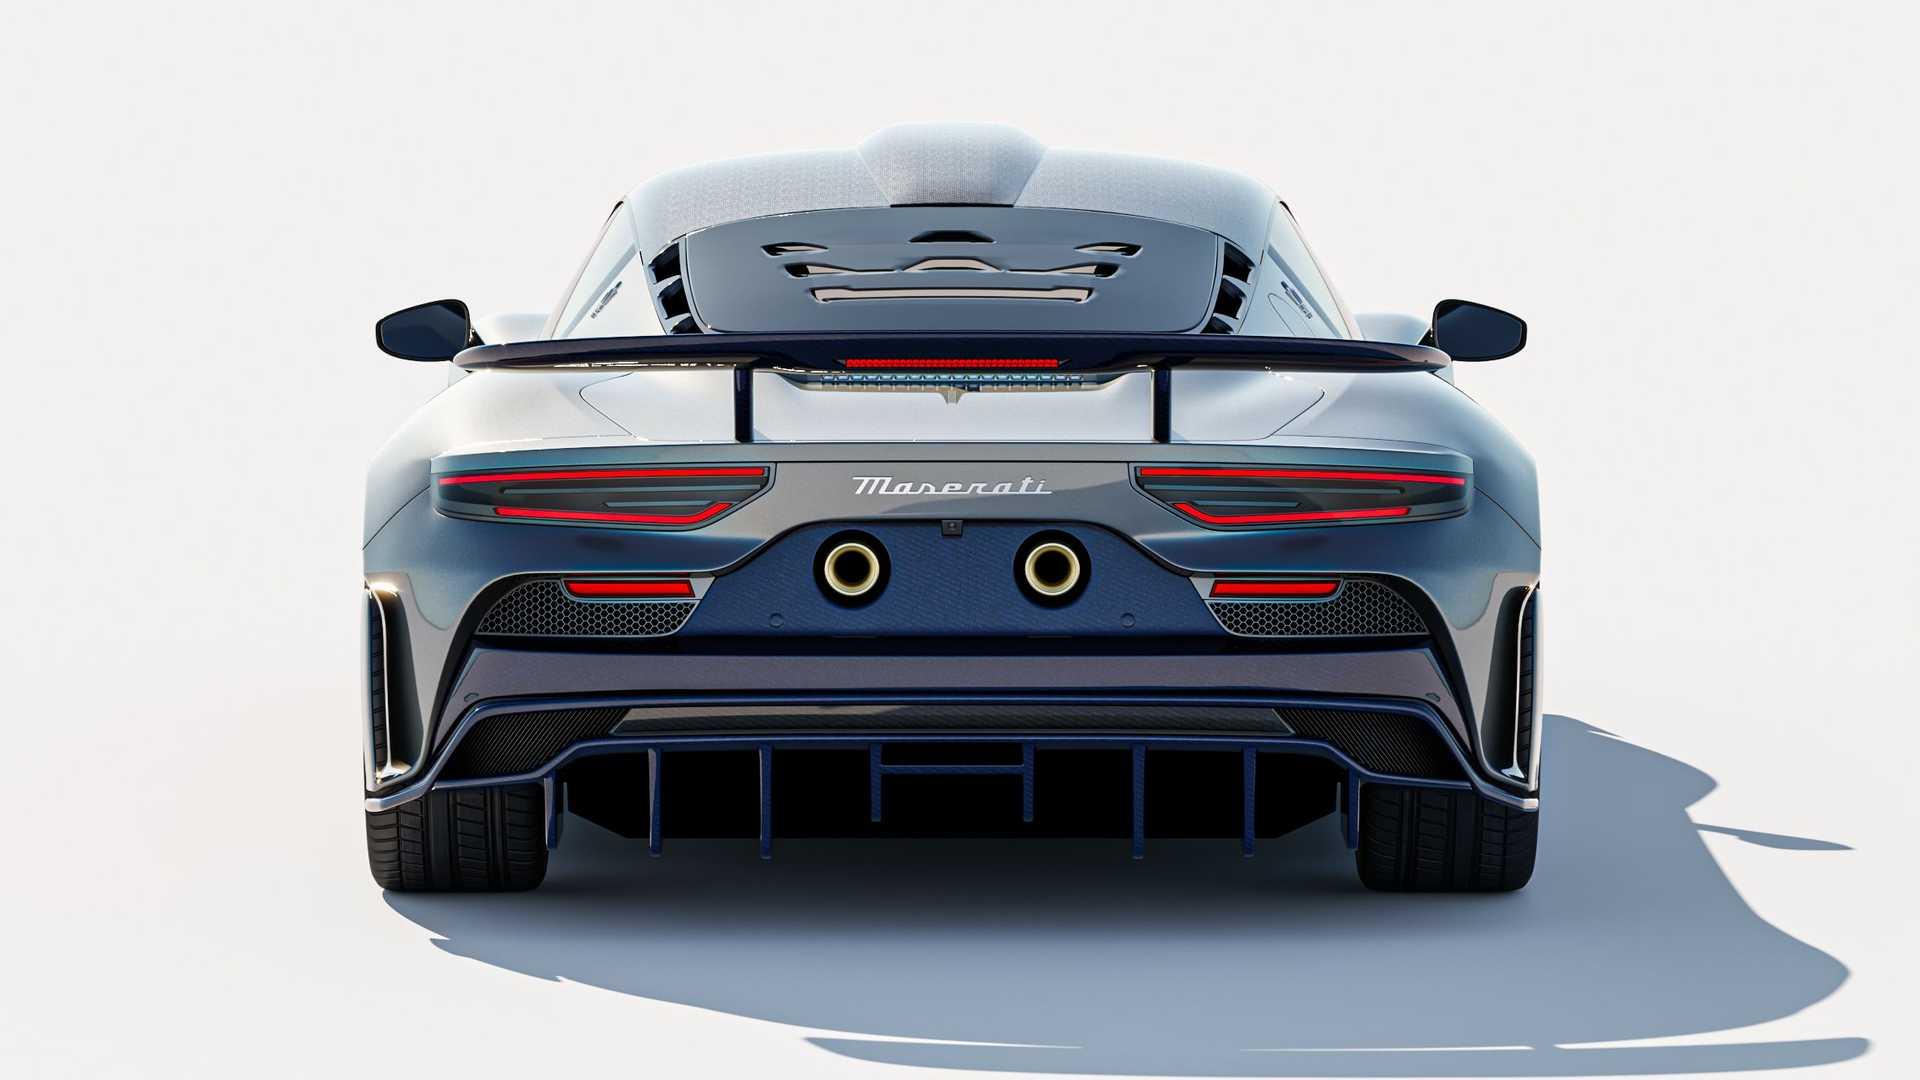 Maserati-MC20-bodykit-by-7-Designs-6